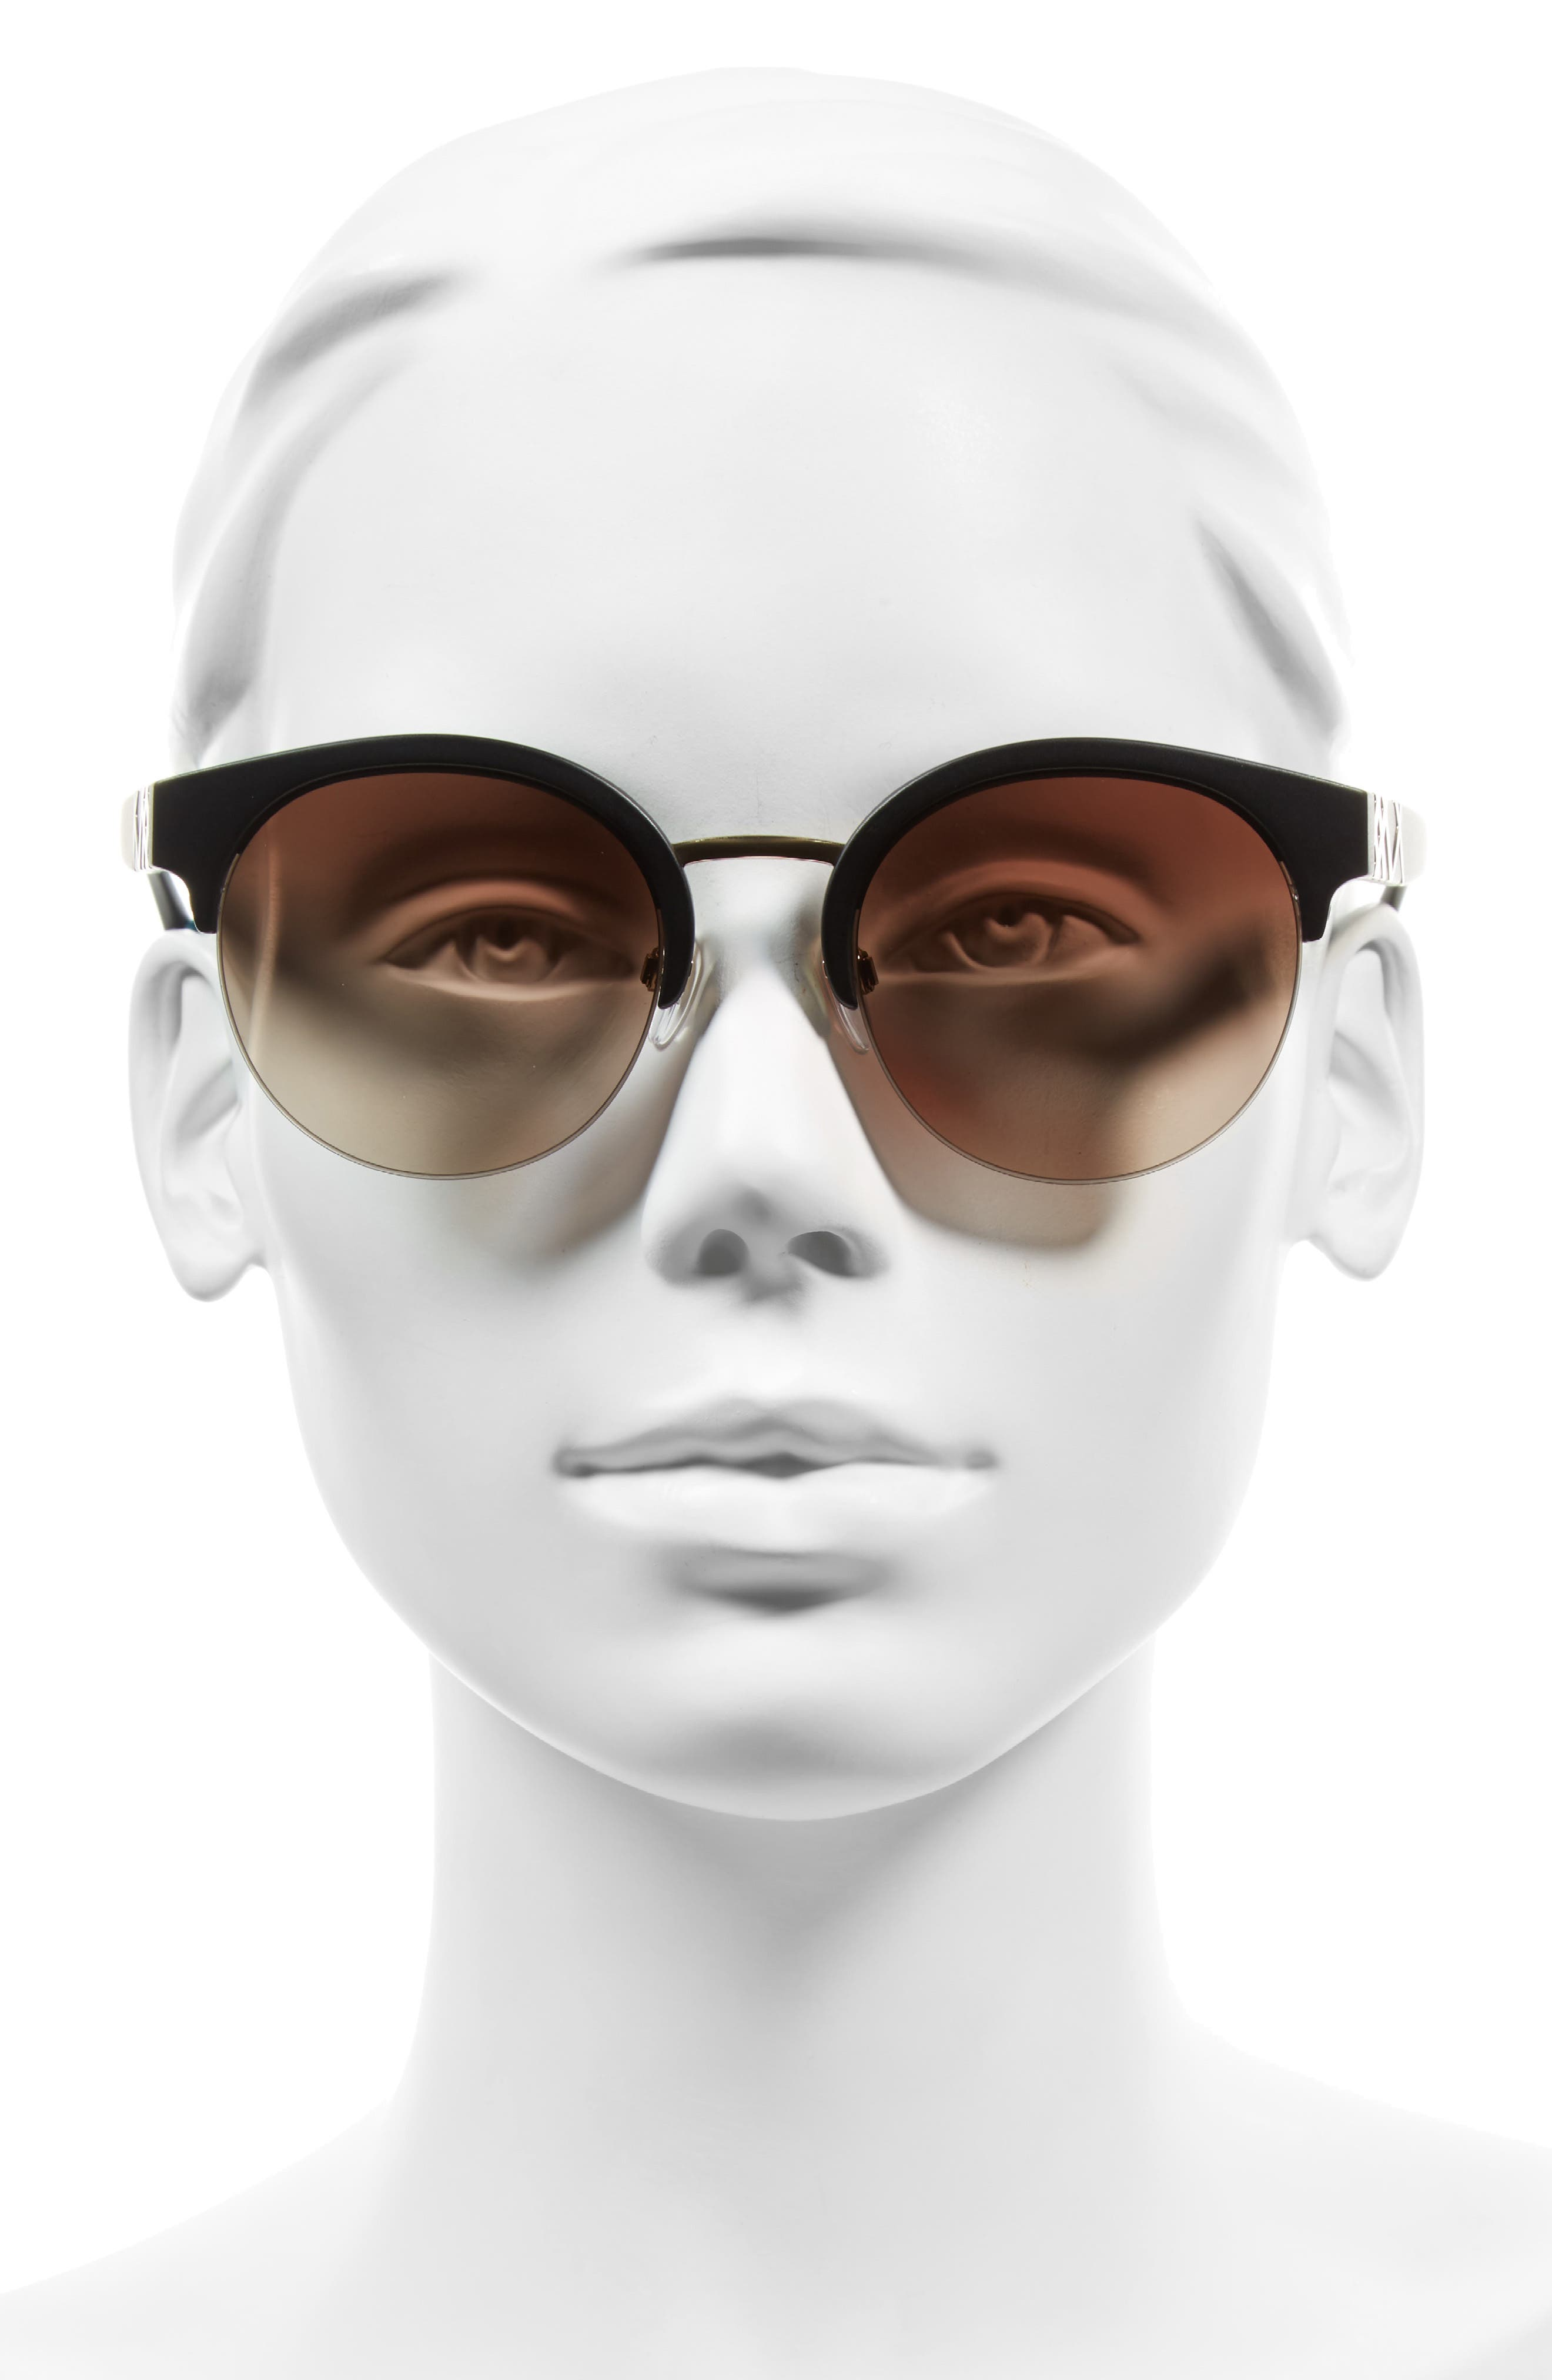 52mm Gradient Semi Rimless Sunglasses,                             Alternate thumbnail 4, color,